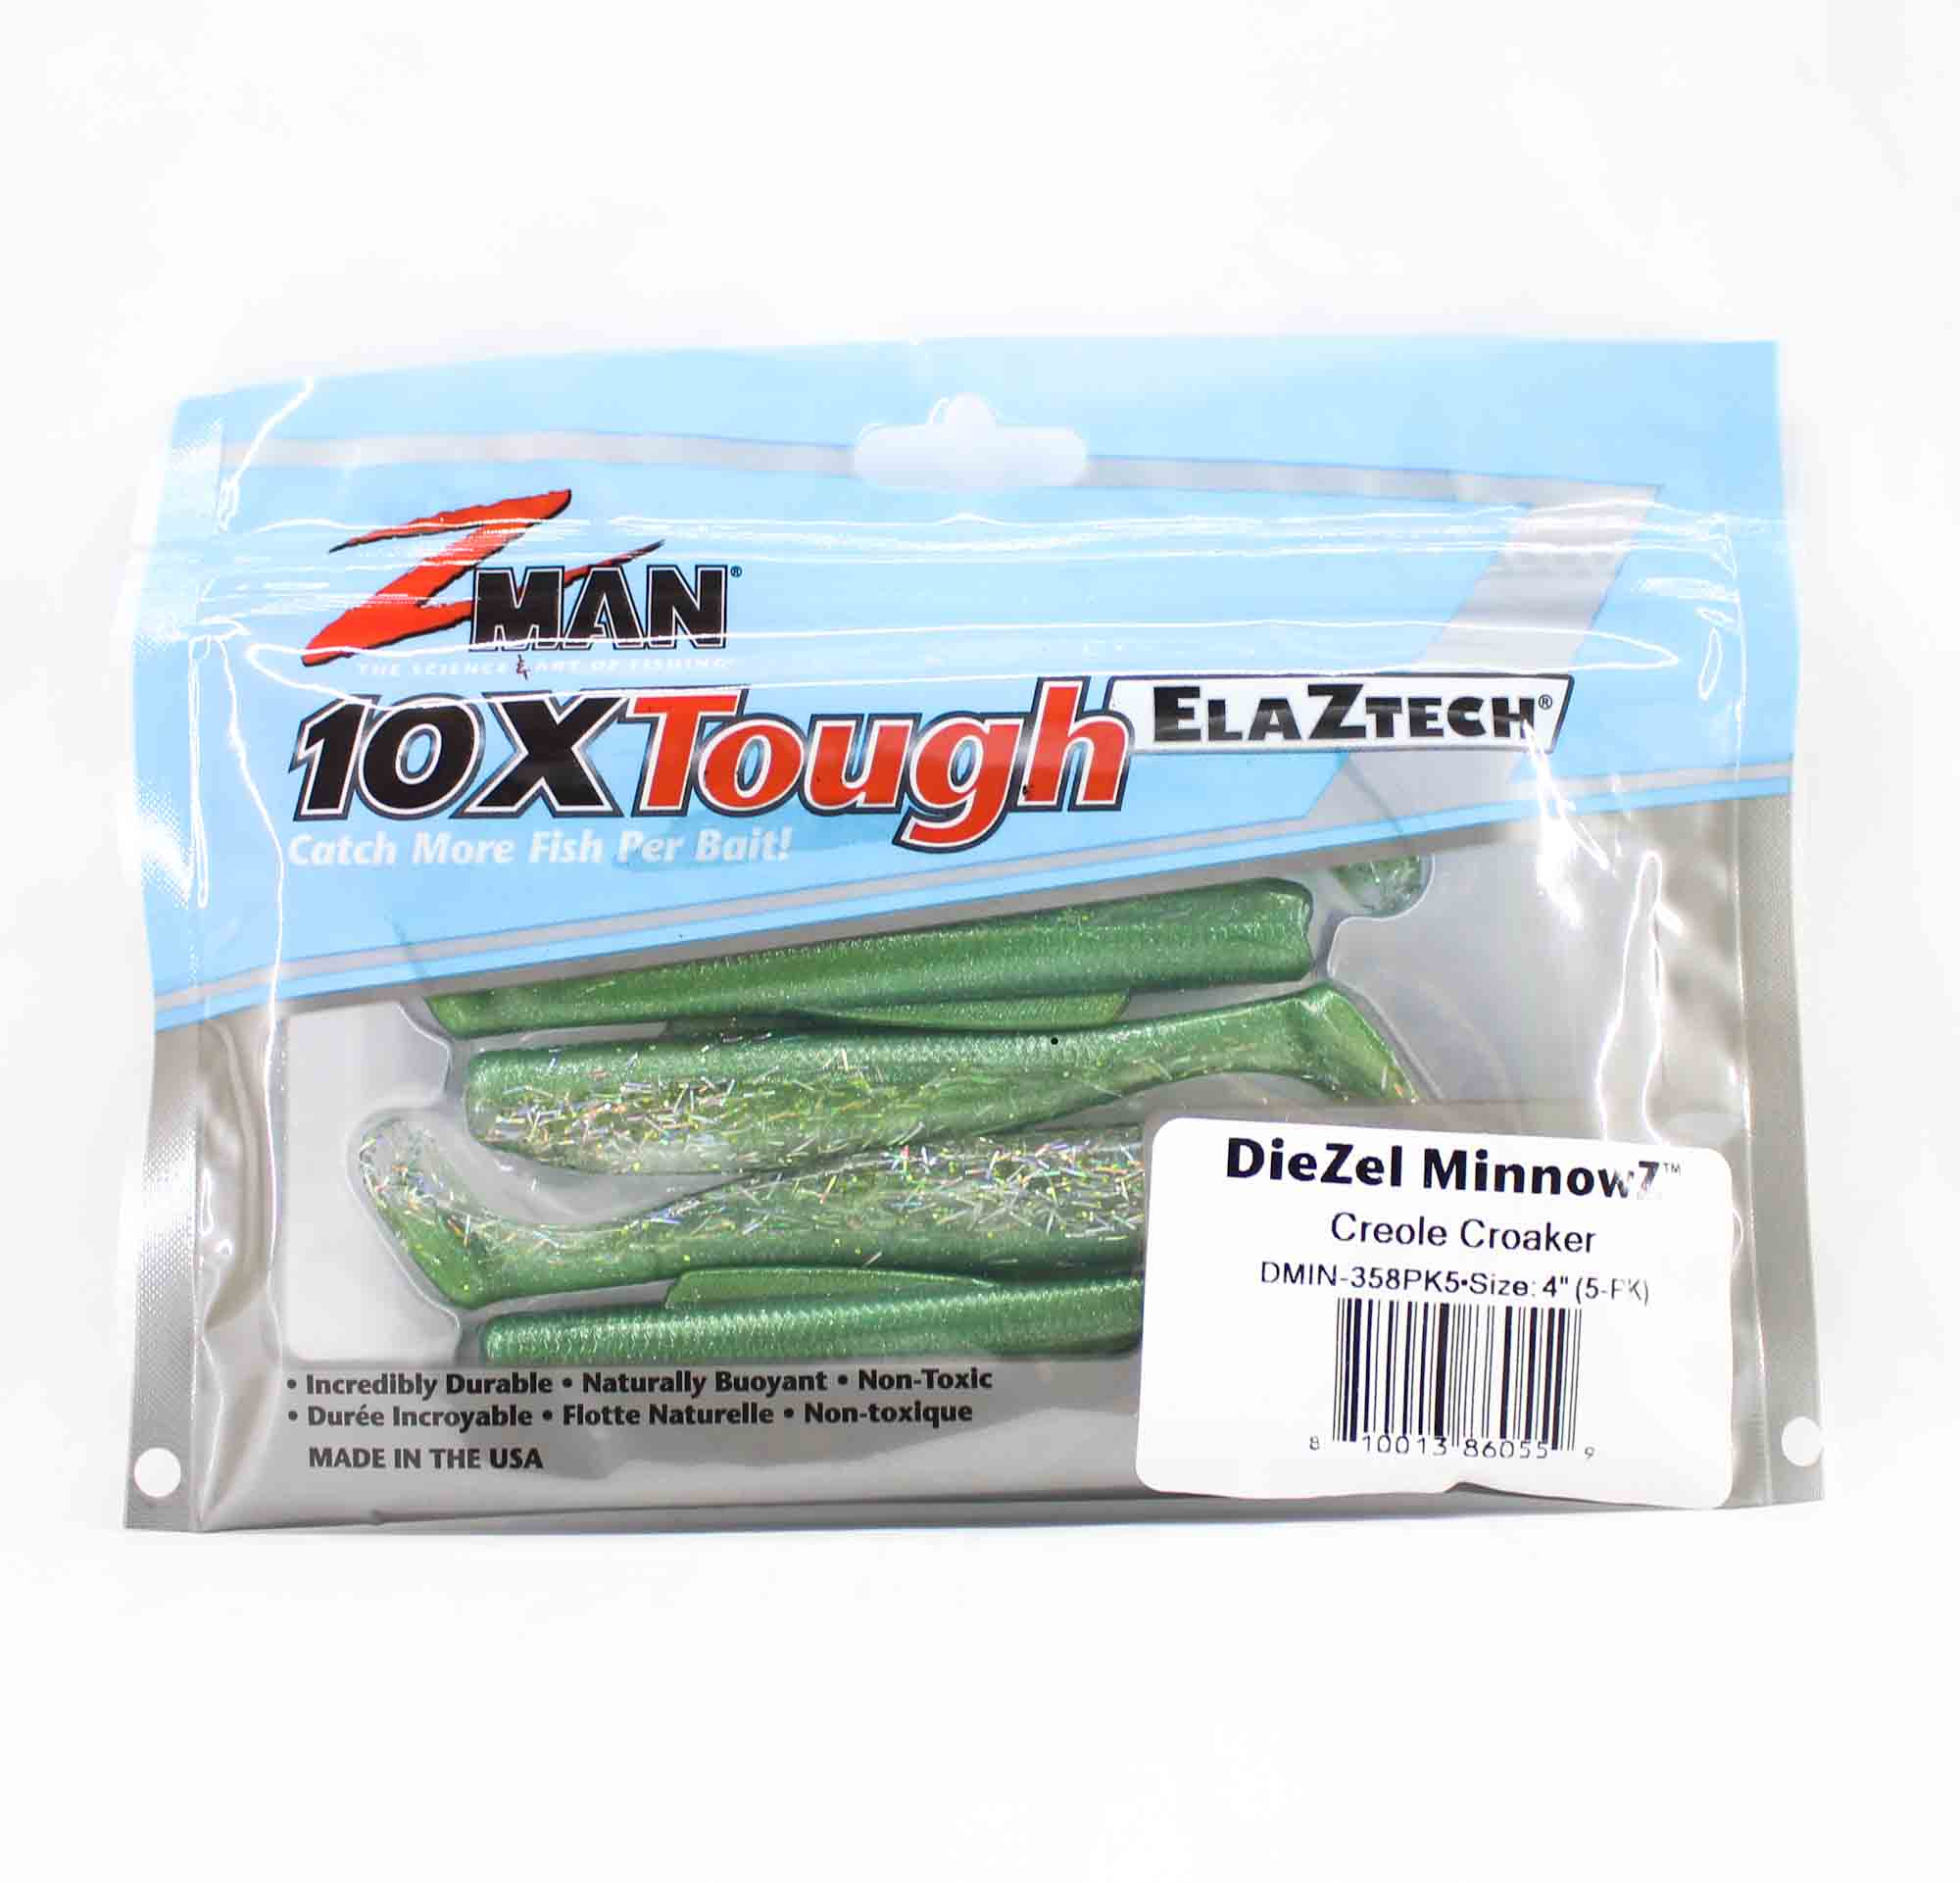 Zman Soft Lure Diezel MinnowZ 4 Inch 5 per pack Creole Croaker (0559)